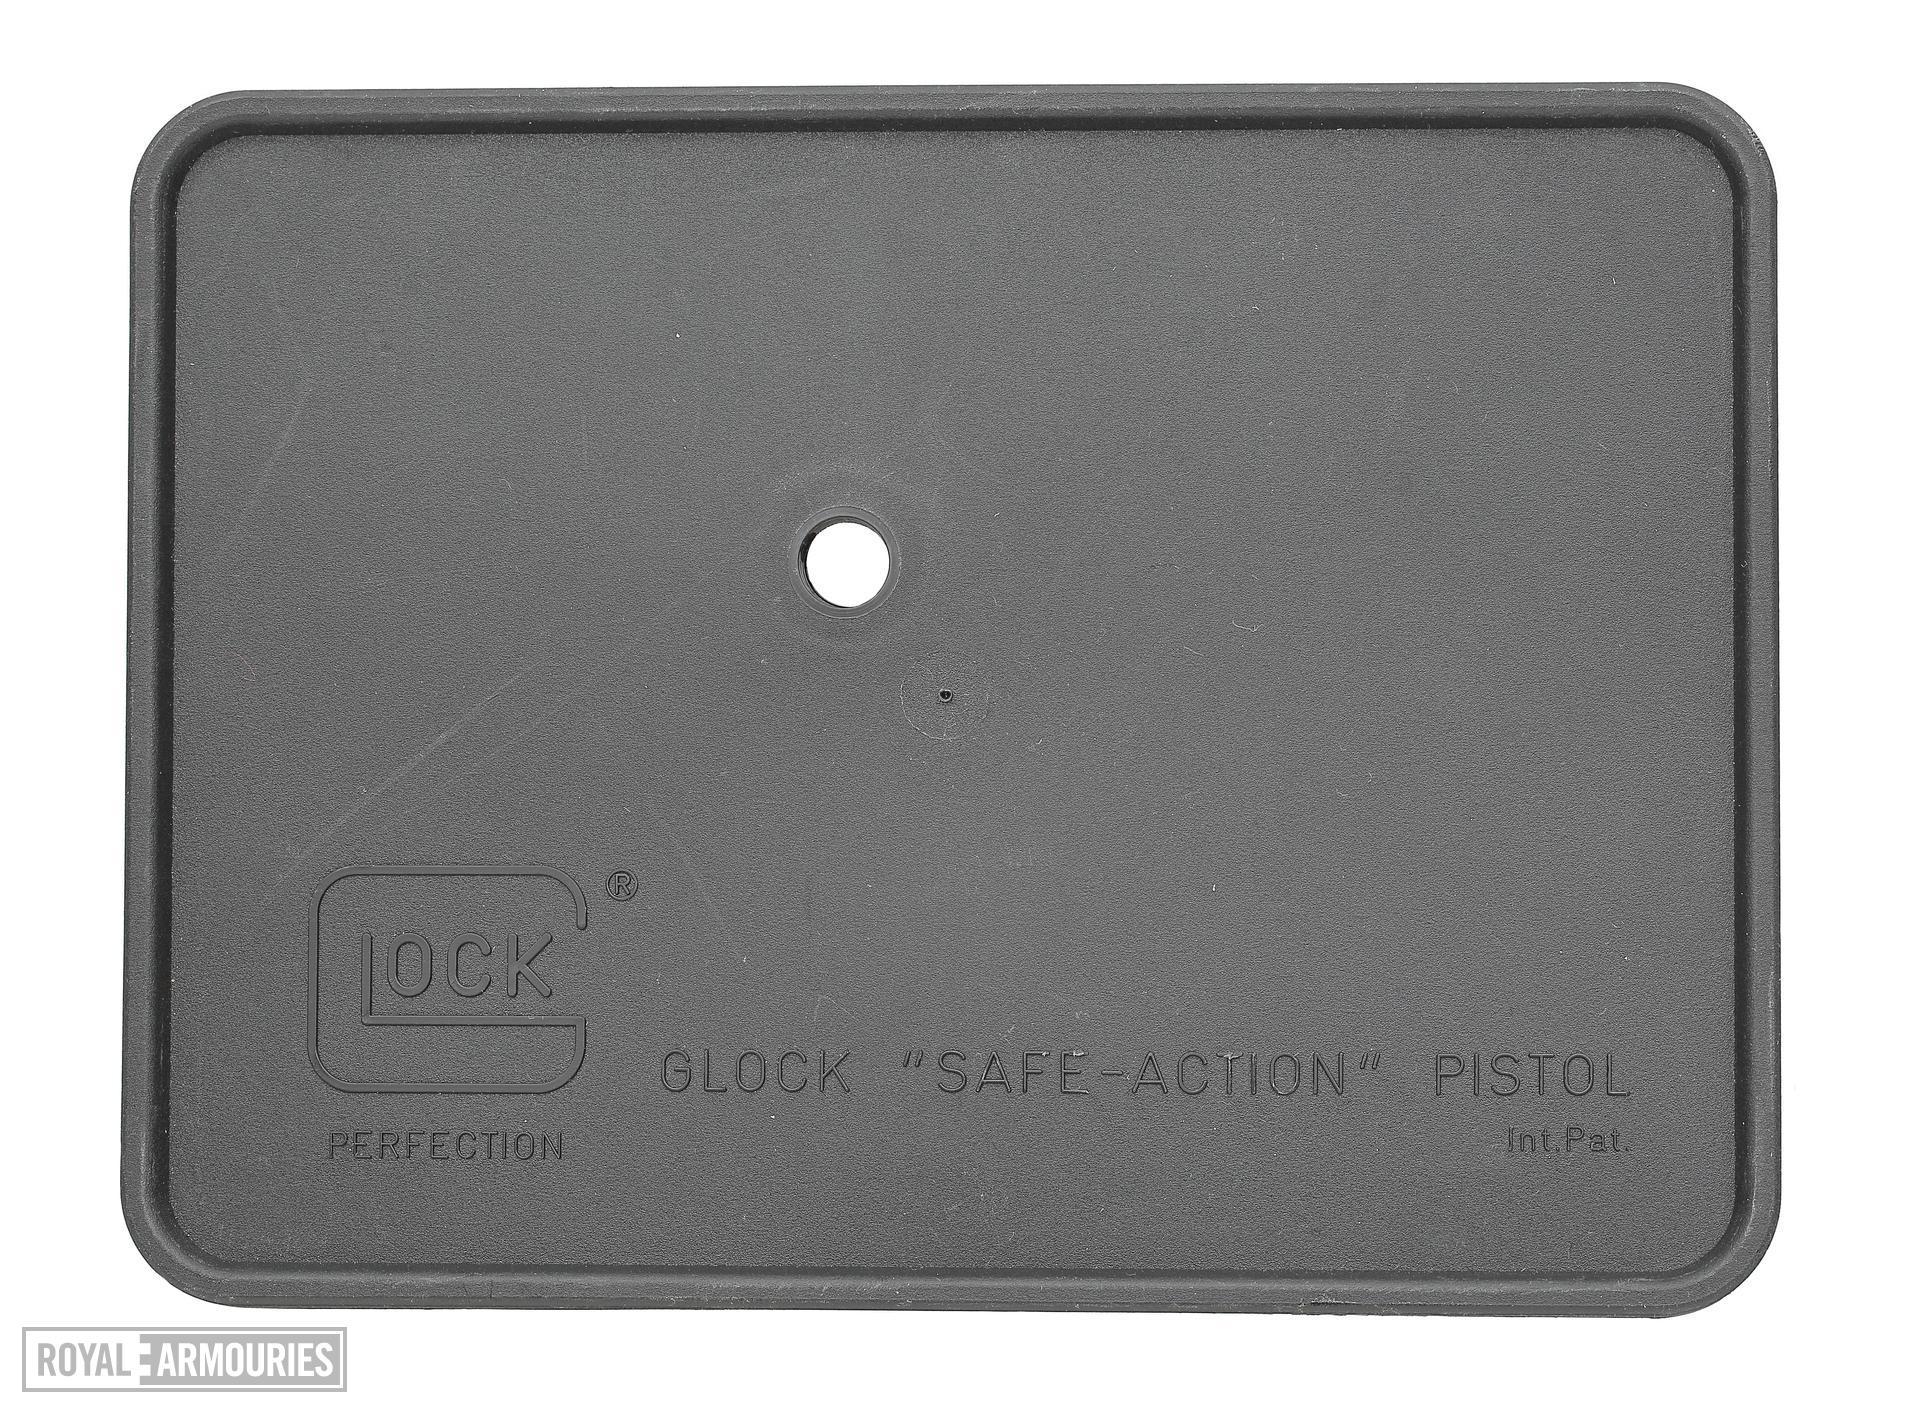 Centrefire automatic pistol - Glock 18 Generation 2 (1992